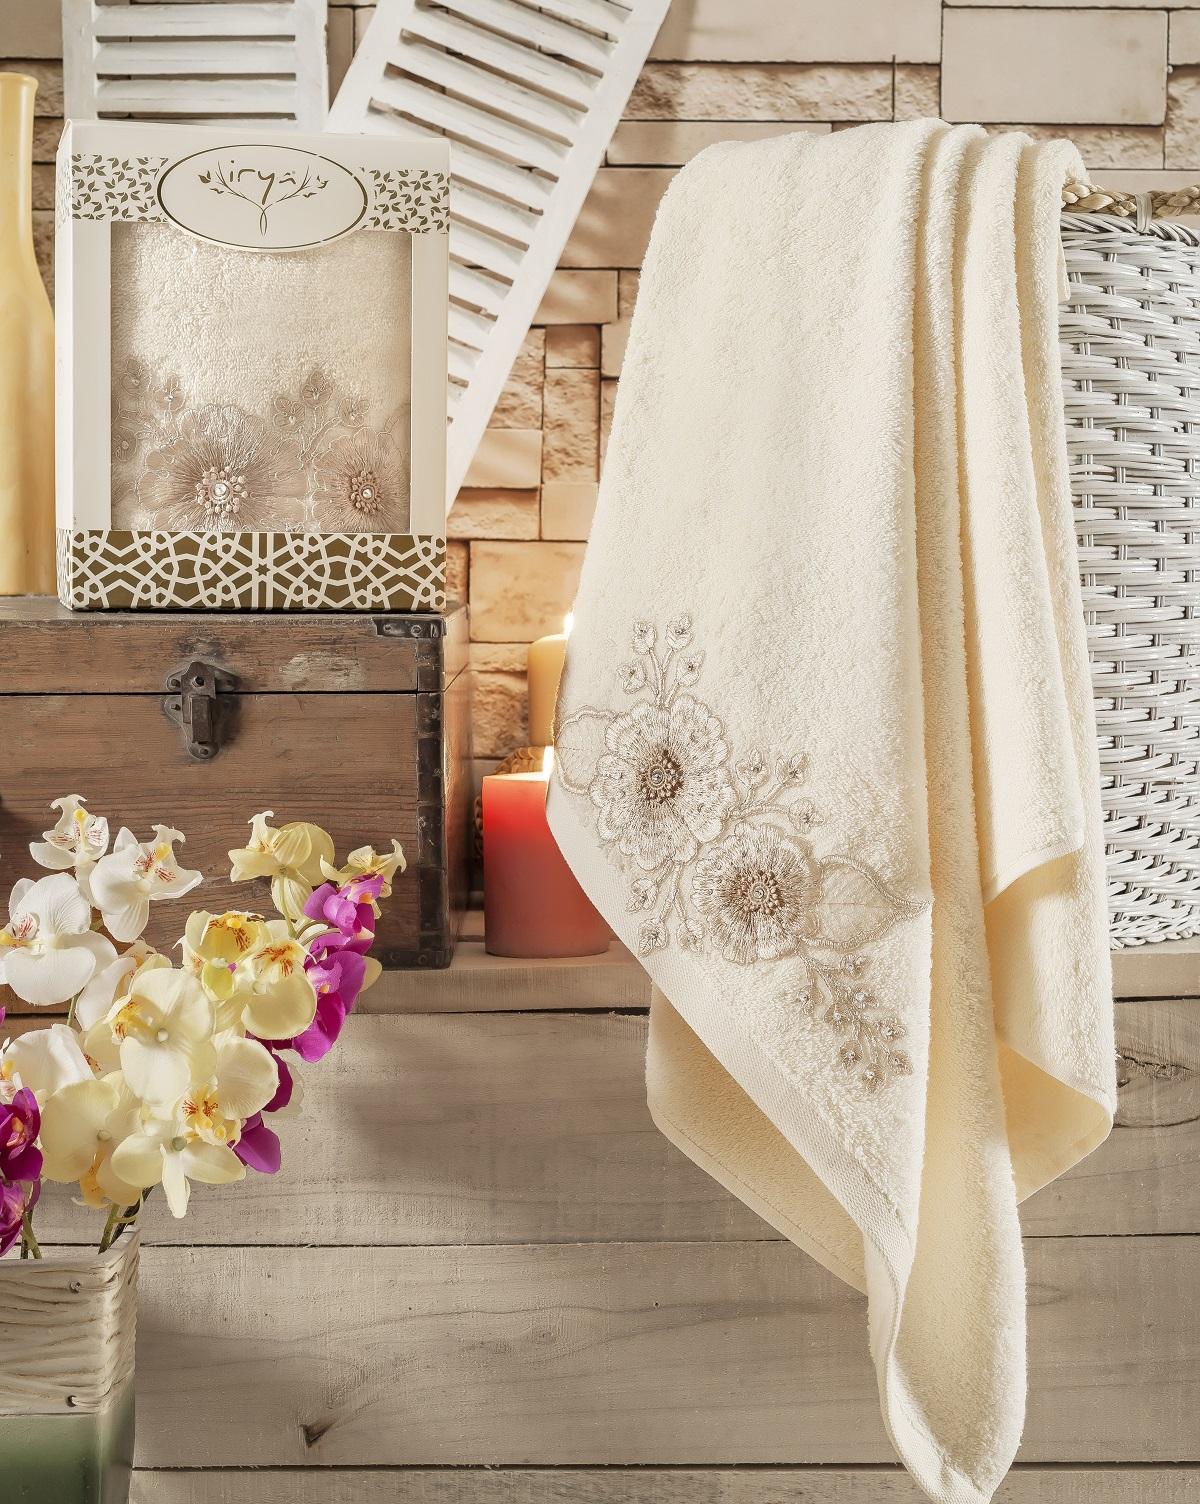 Купить Полотенца IRYA, Полотенце Fleur Цвет: Золотистый (85х150 см), Турция, Махра